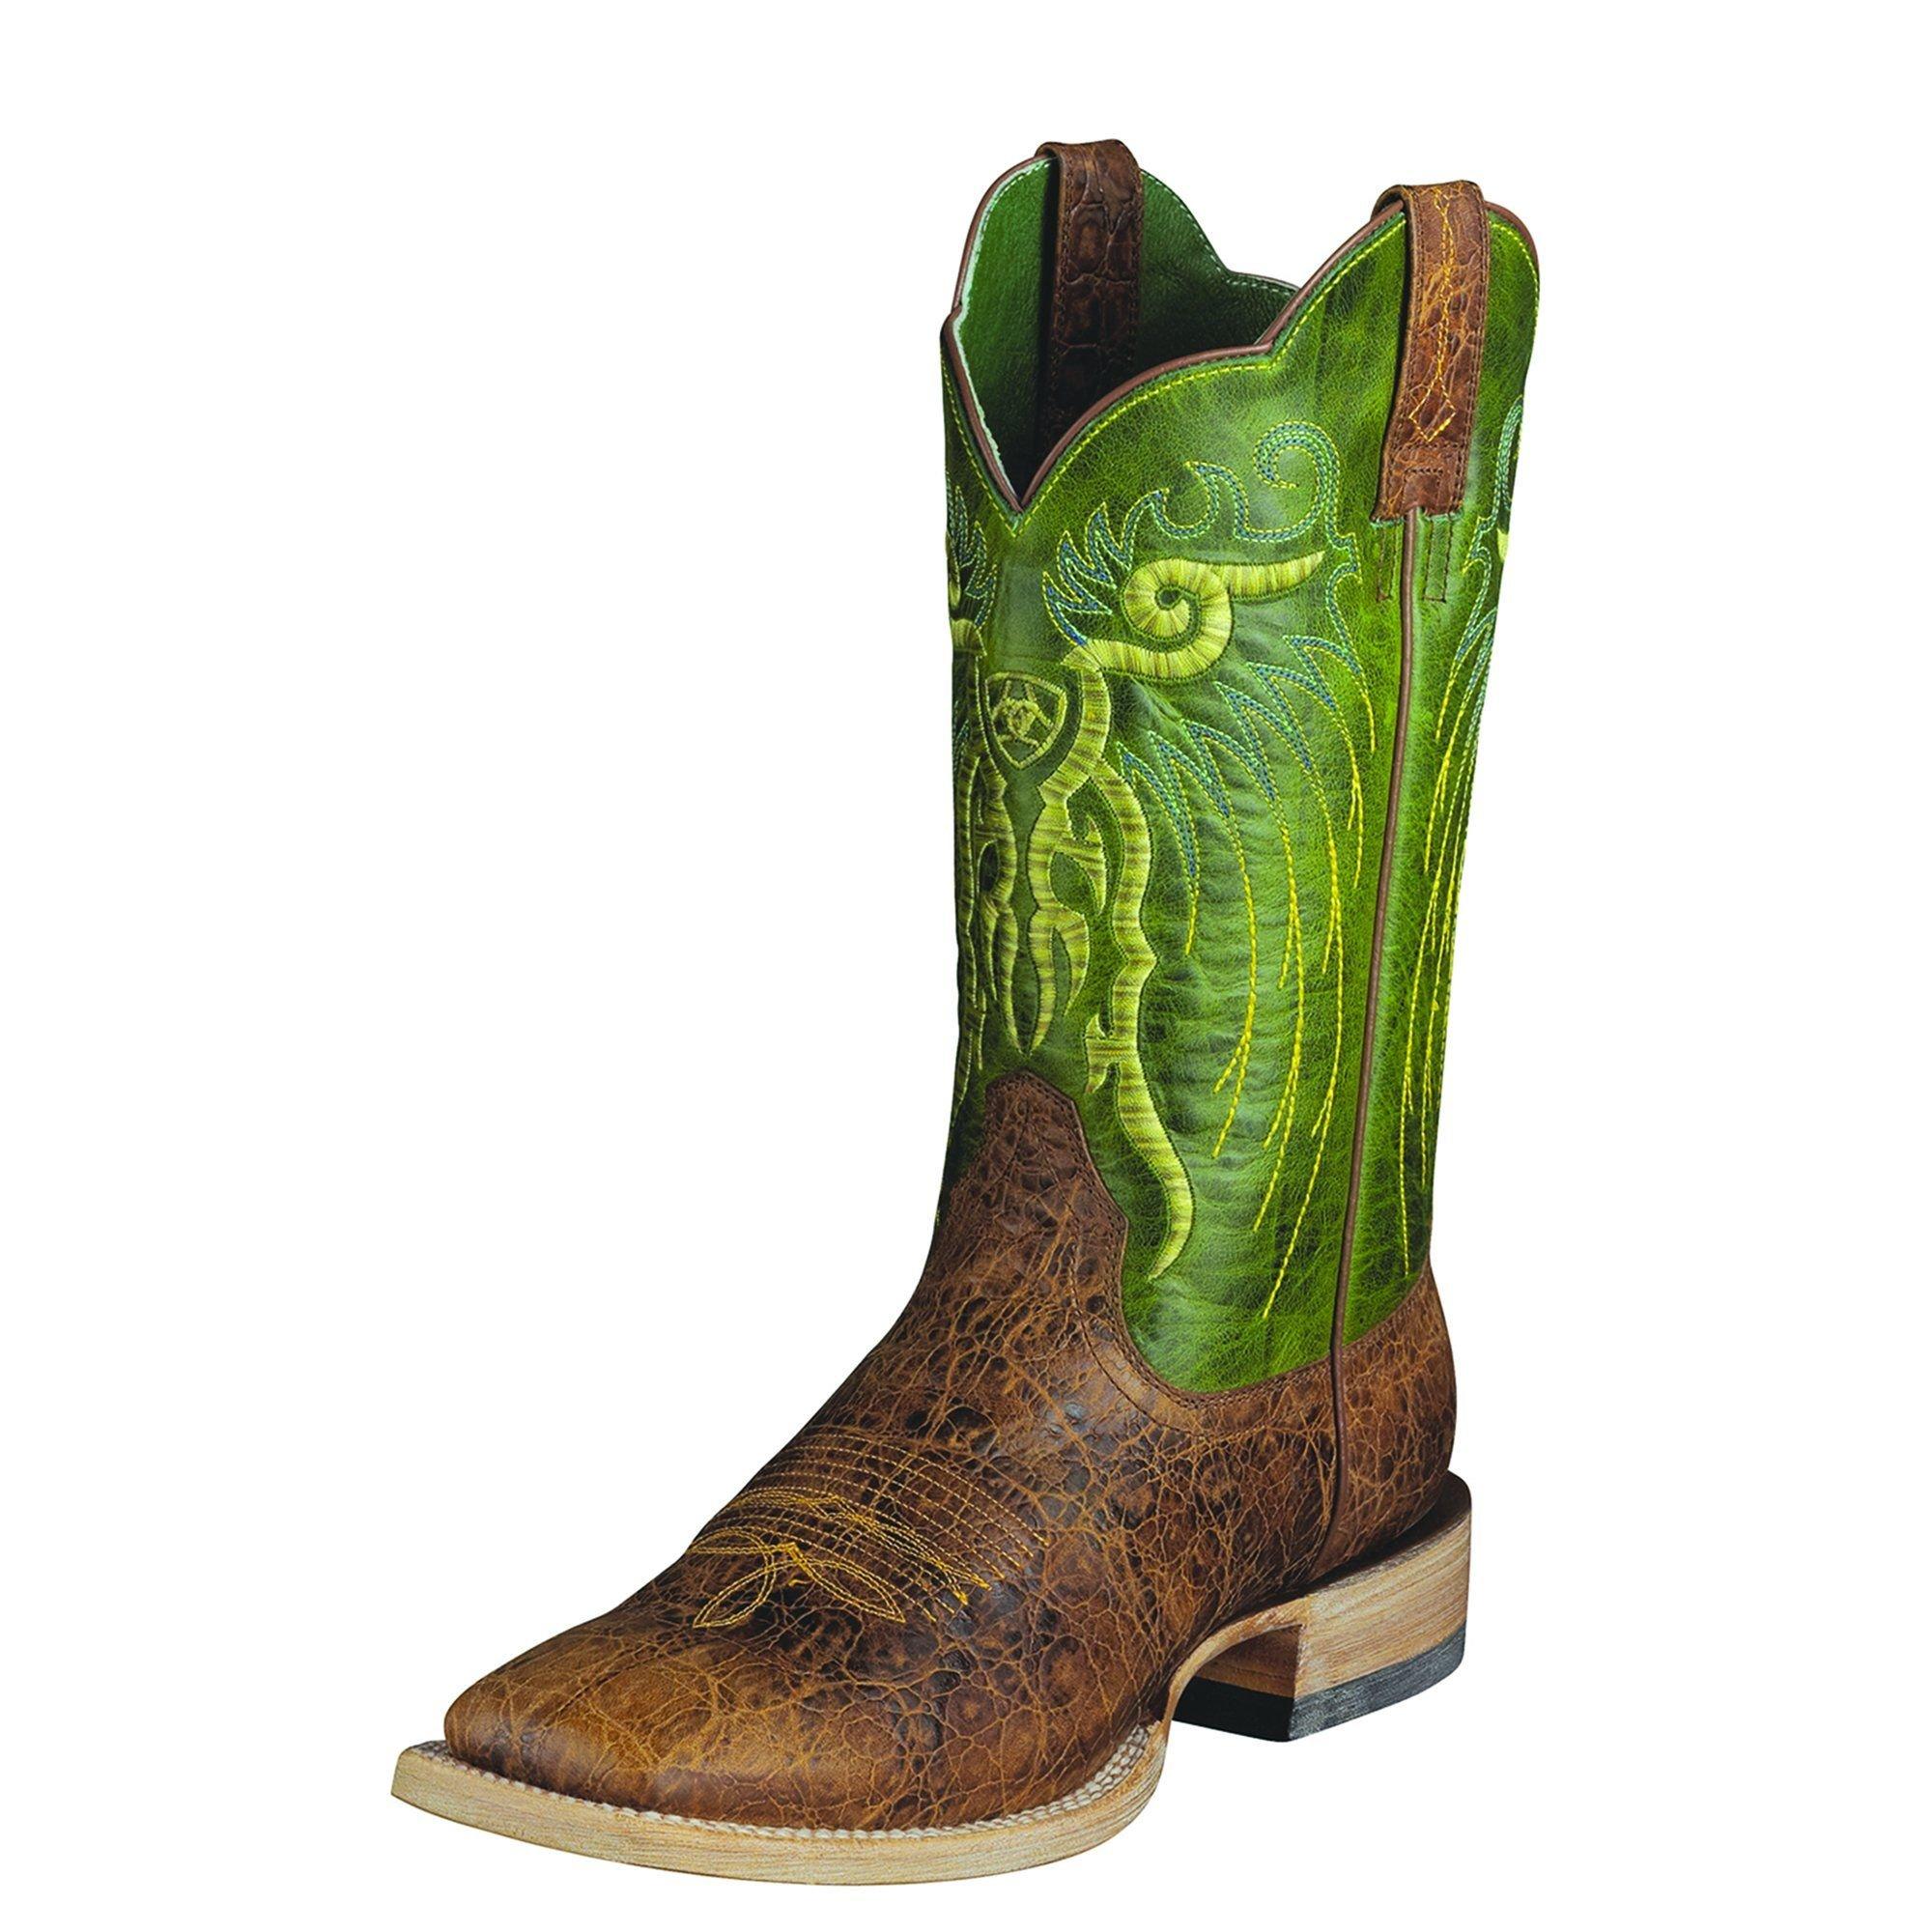 Ariat Men's Mesteno Western Cowboy Boot, Adobe Clay/Neon Lime, 9 W US